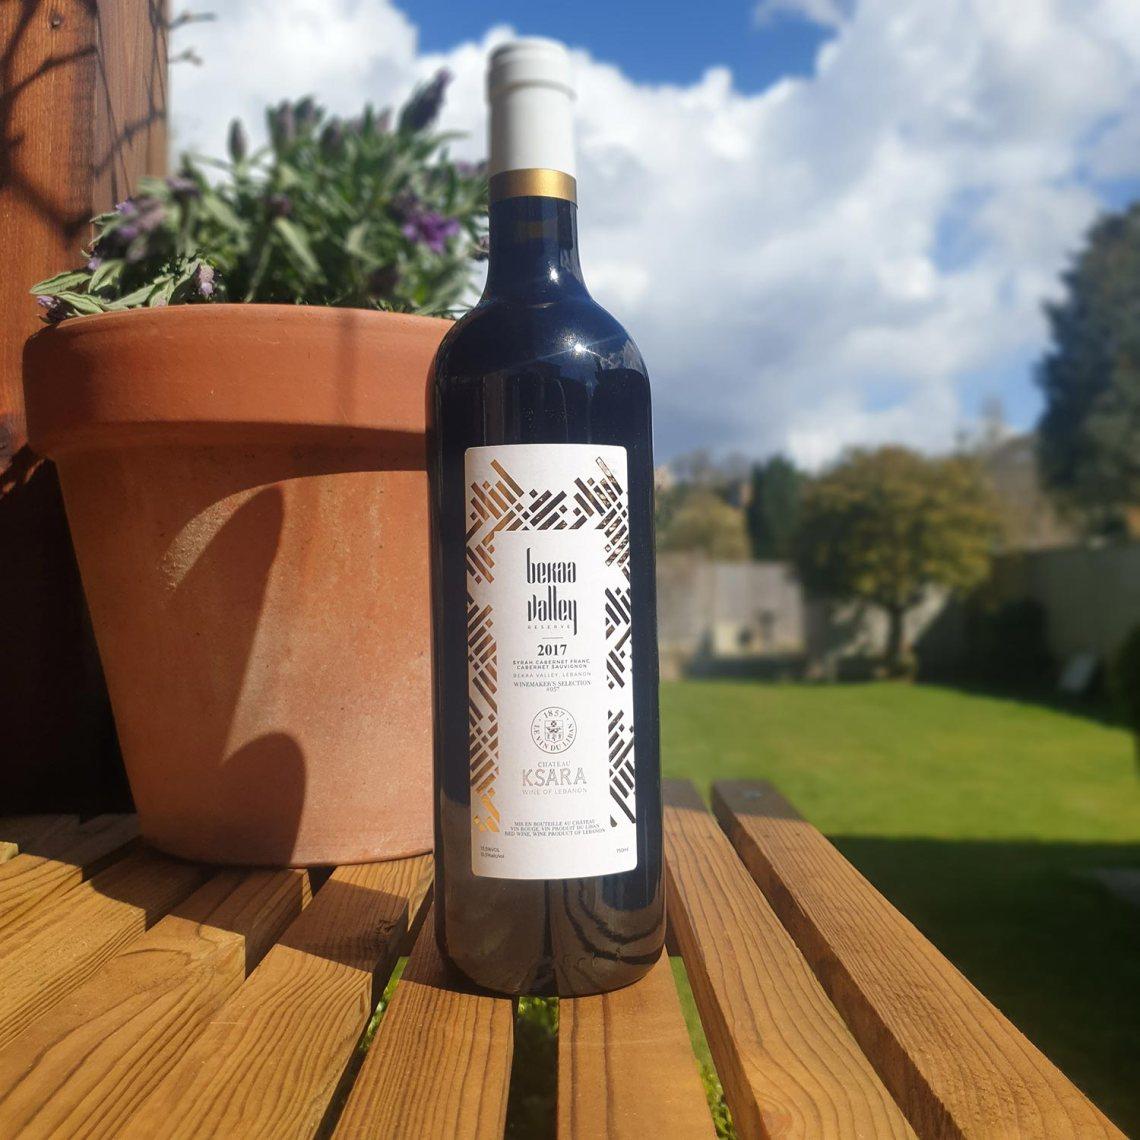 Chateau Ksara, Reserve du Couvent 2017 - Wine Wednesday - Female Original